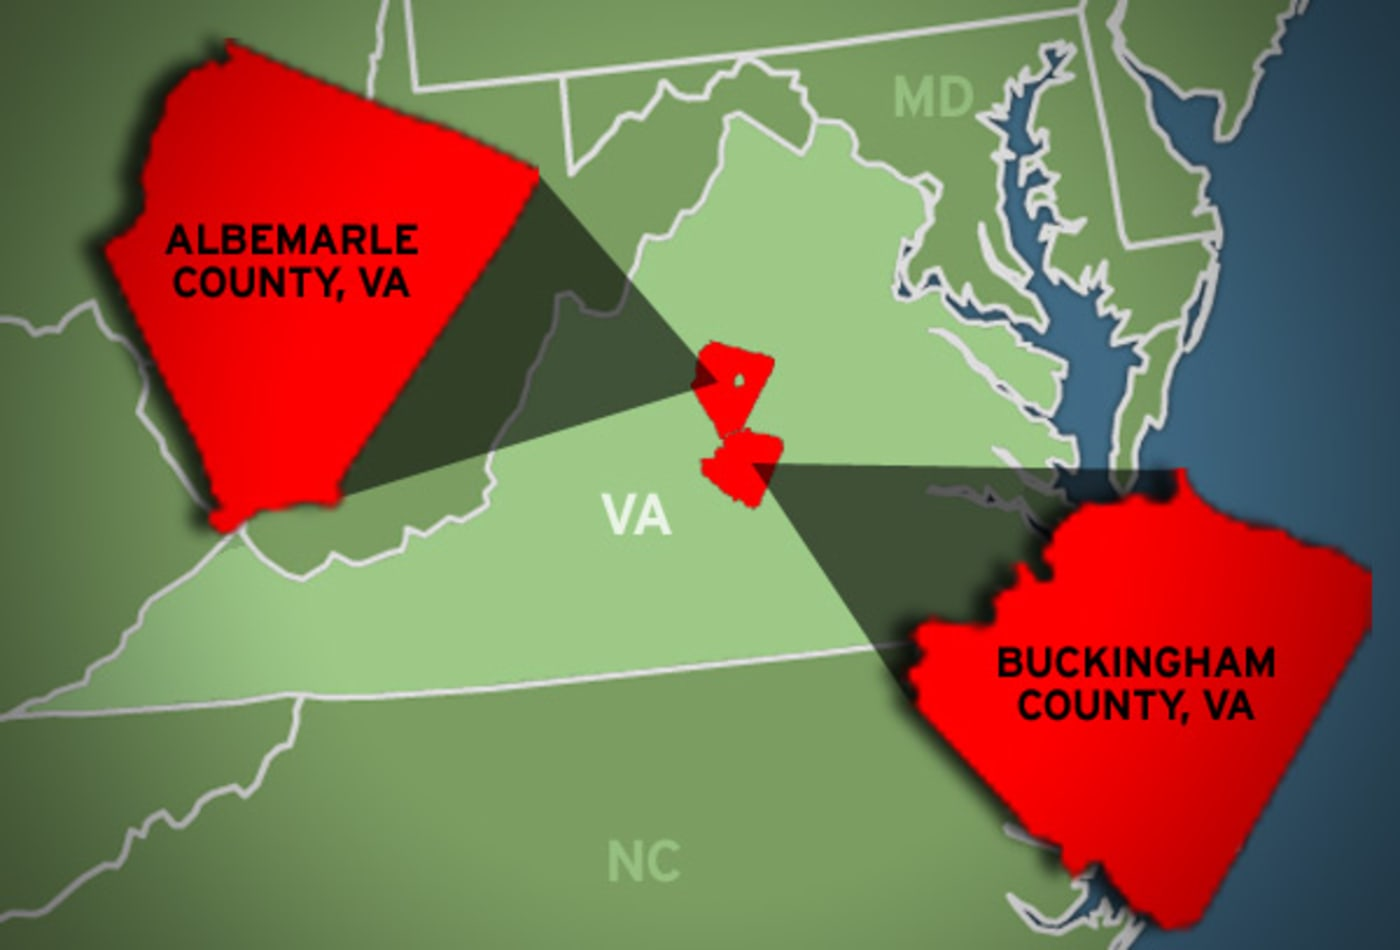 americas_biggest-wealth-gap-county_to_county_slide_9.jpg